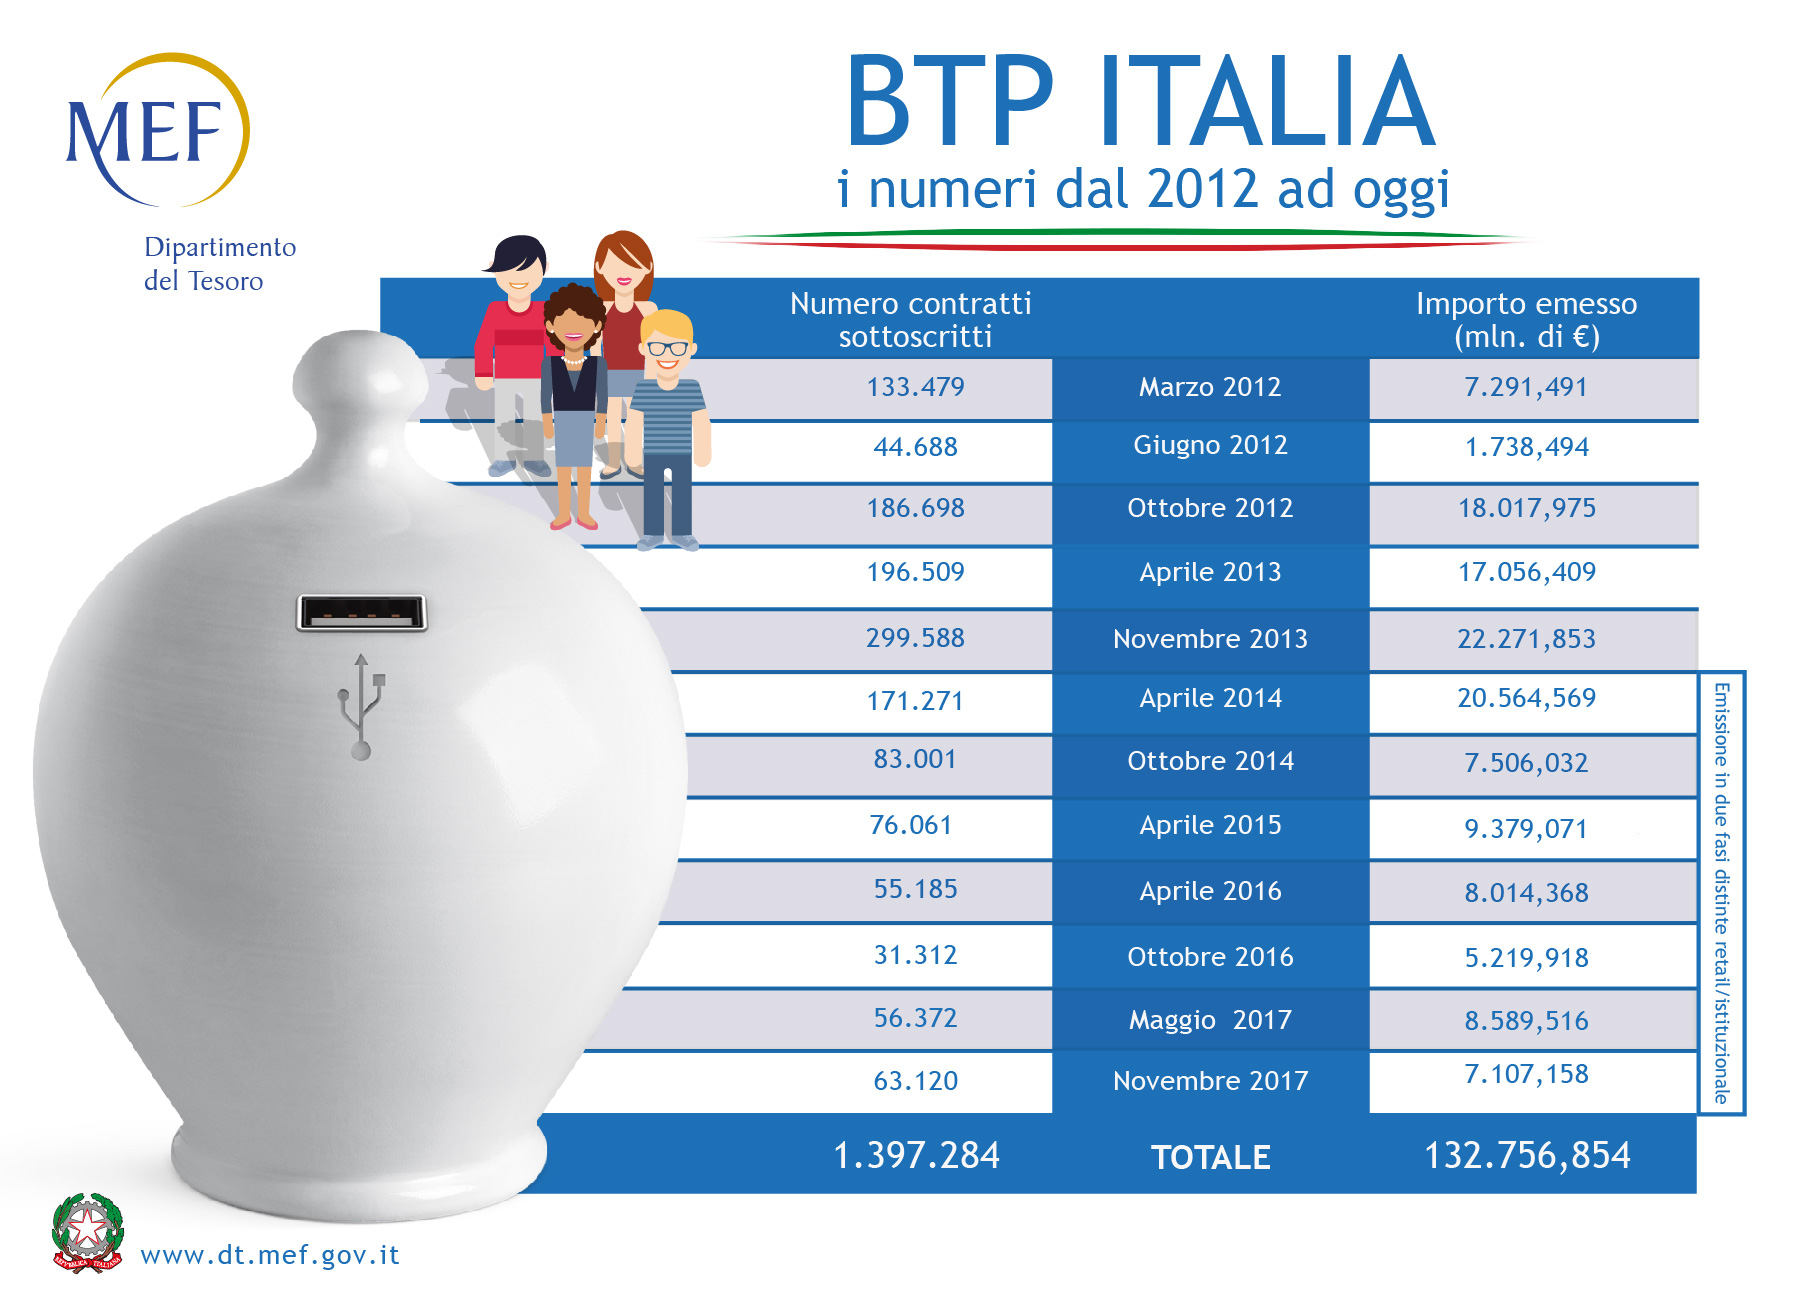 Tesoro, BTP Italia: al via la tredicesima edizione